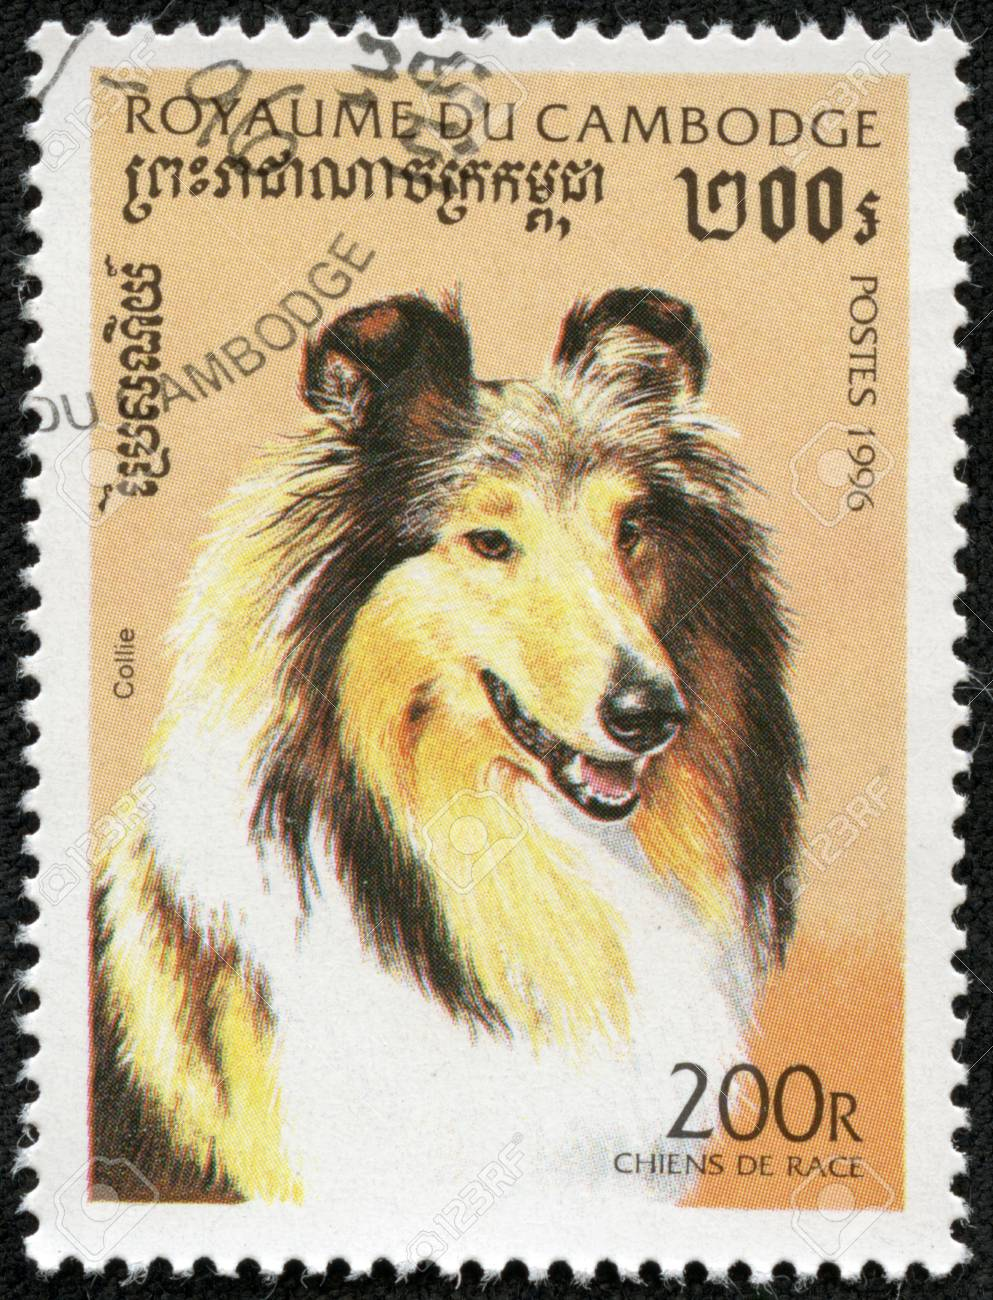 CAMBODIA - CIRCA 1996  A stamp printed in Cambodia shows Dog, circa 1996 Stock Photo - 17199289